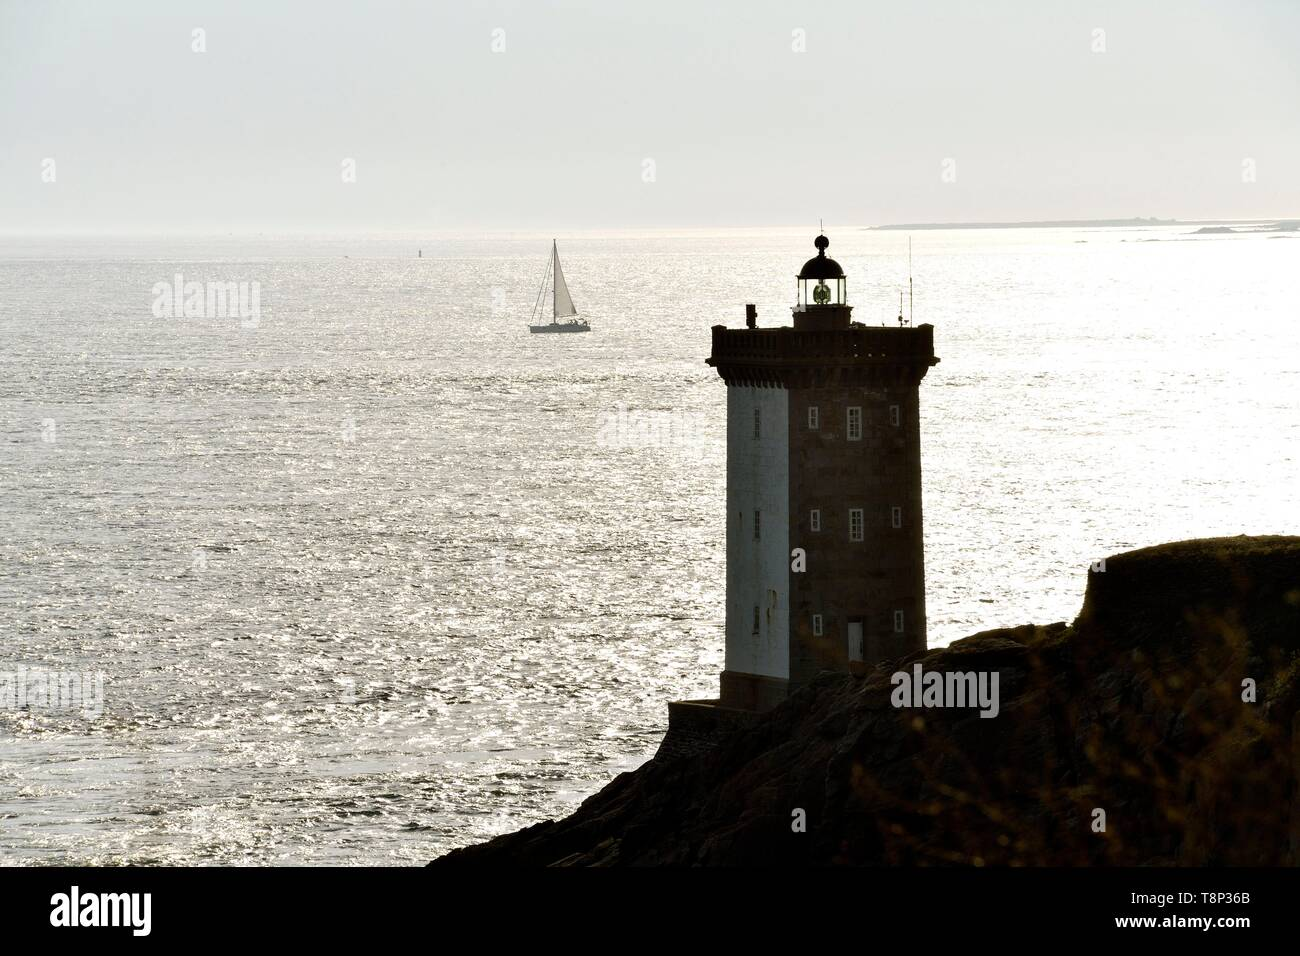 France, Finistere, Iroise see, Armorique Regional natural park, Le Conquet, Kermorvan peninsula, lighthouse Stock Photo